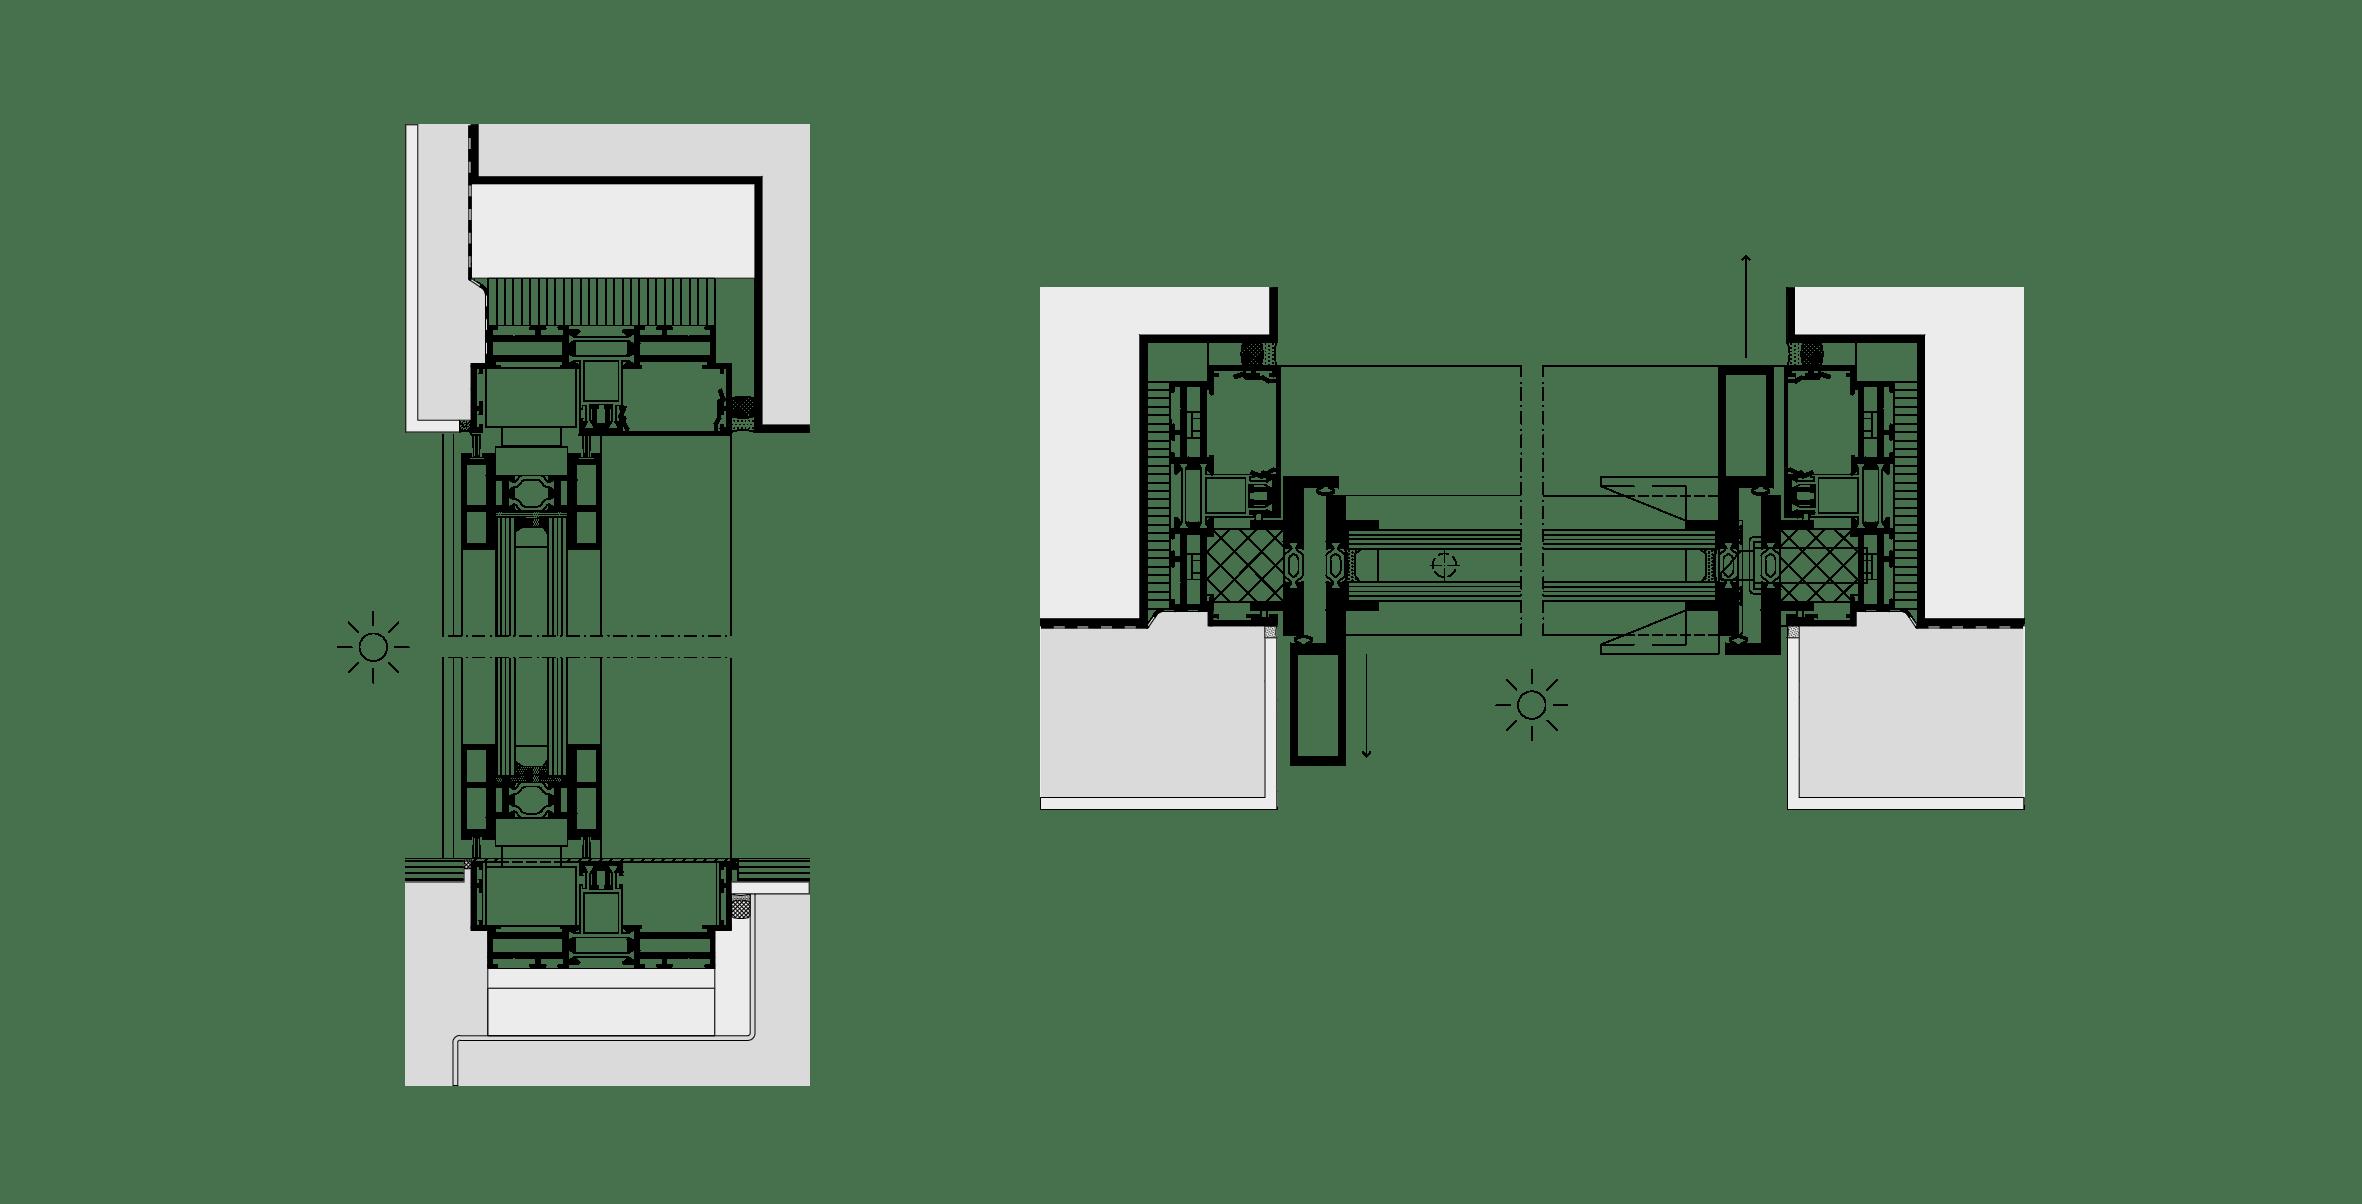 Technical Drawing Sky Frame Pivot.png 2362x1204 Q90 Subsampling 2